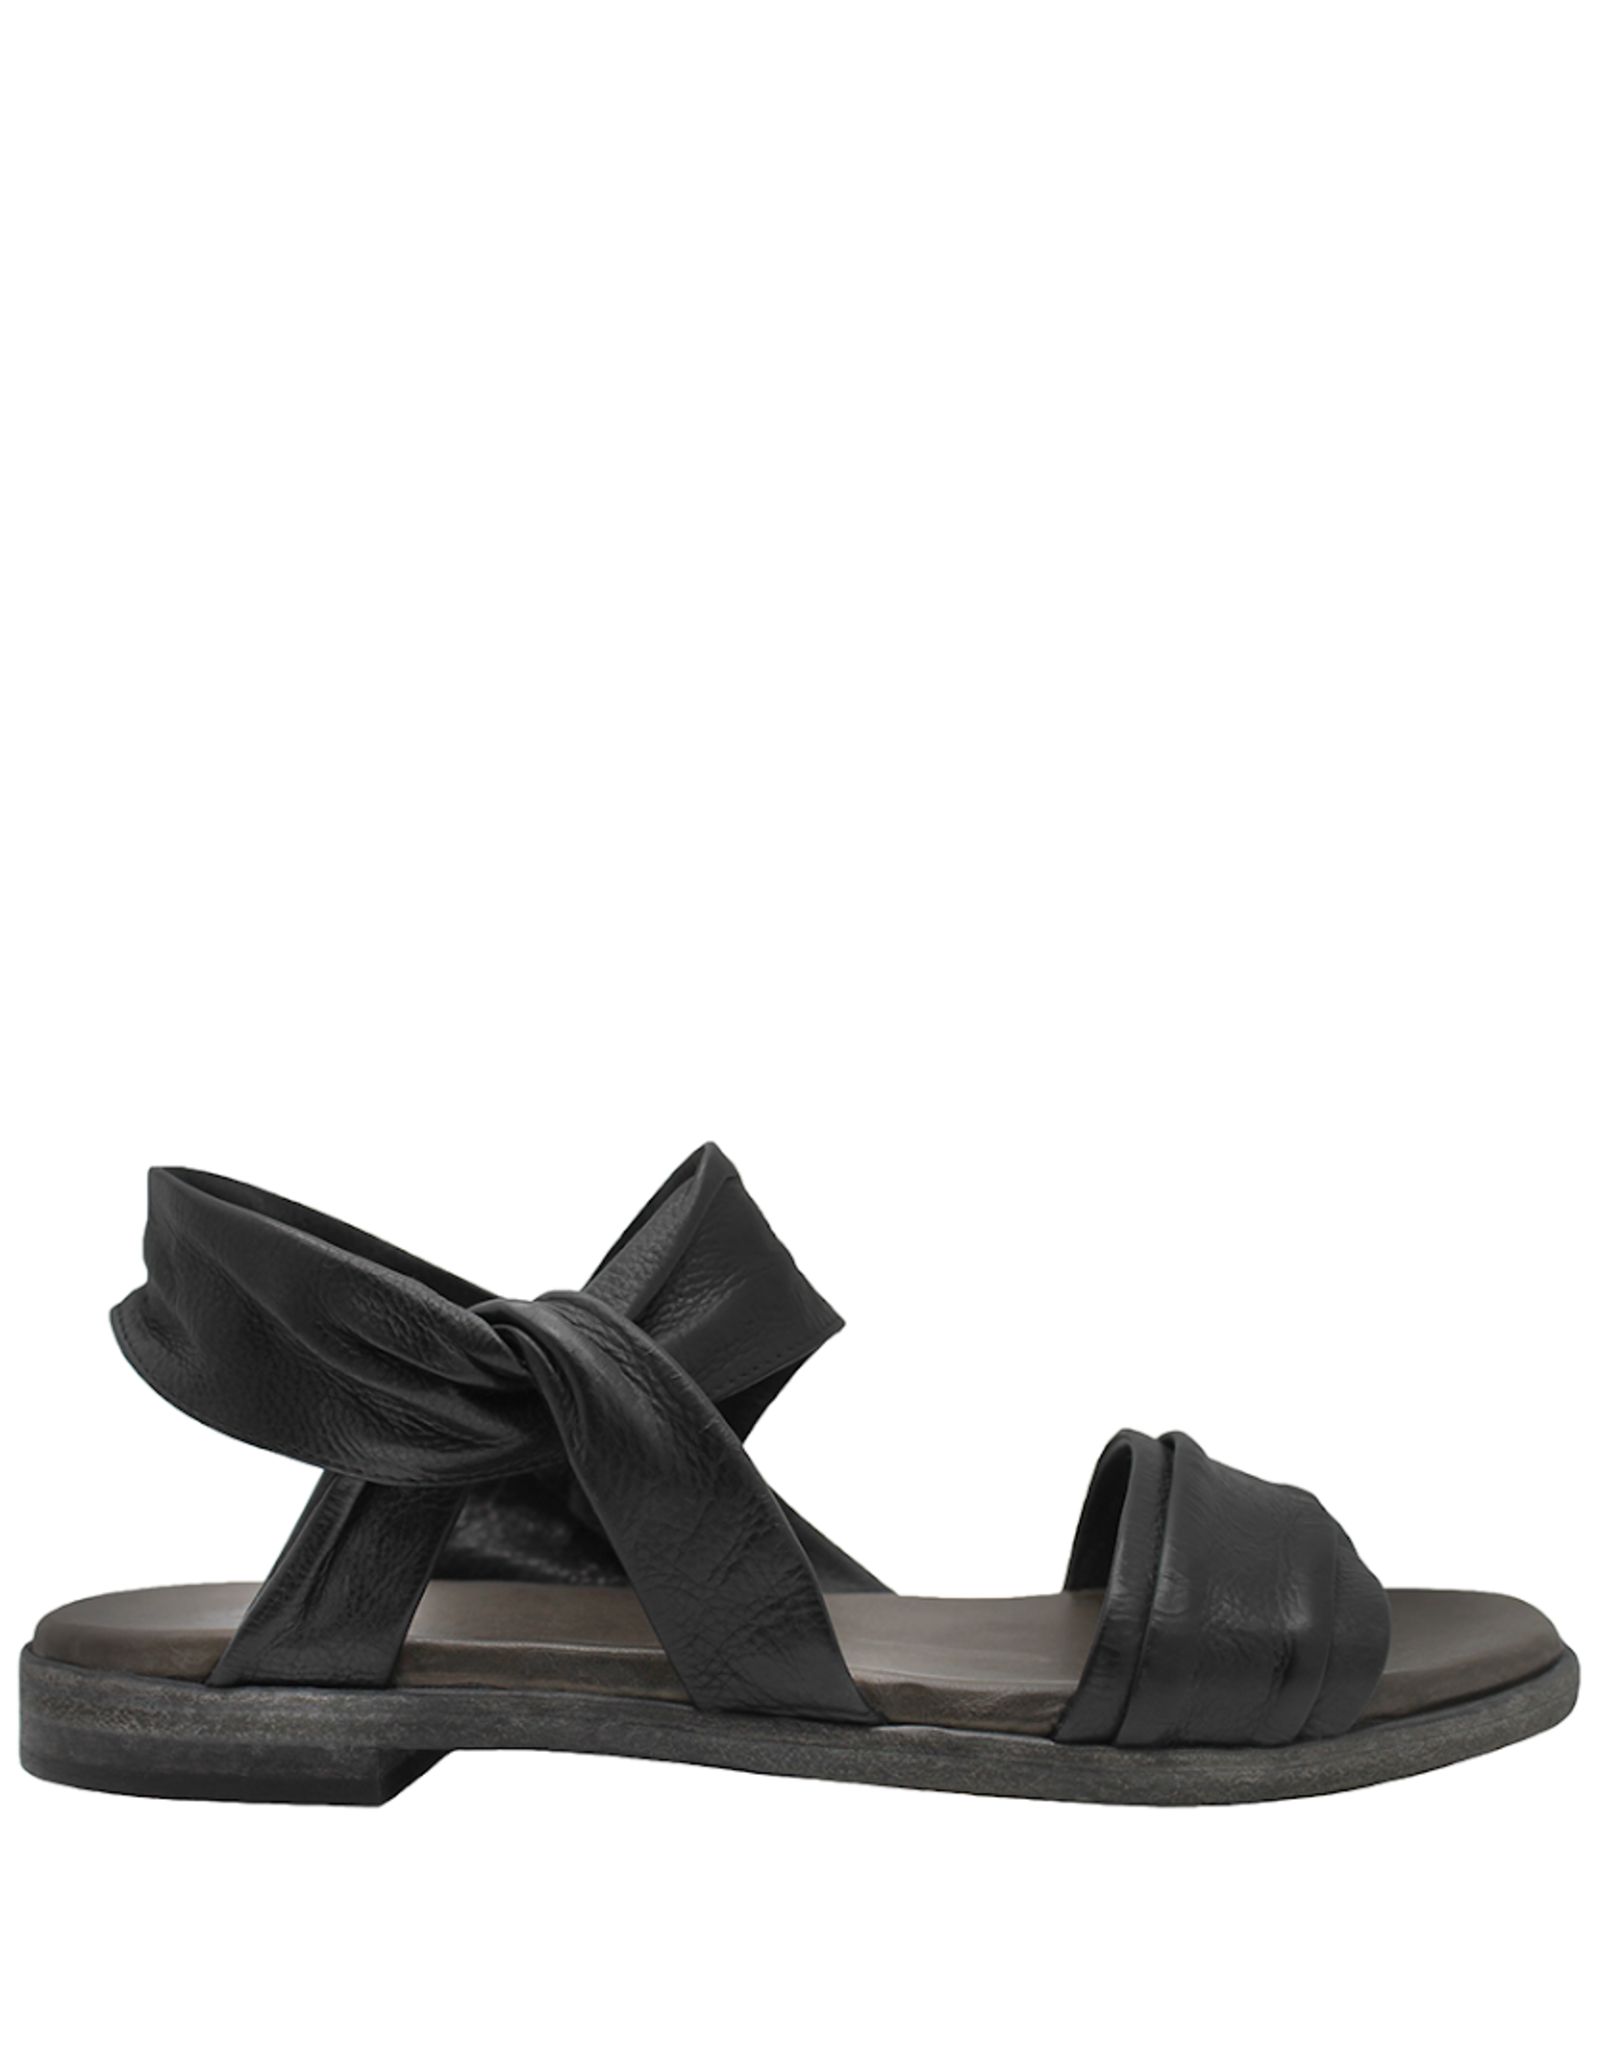 Now Now Black Ankle Strap Flat Sandal Layla